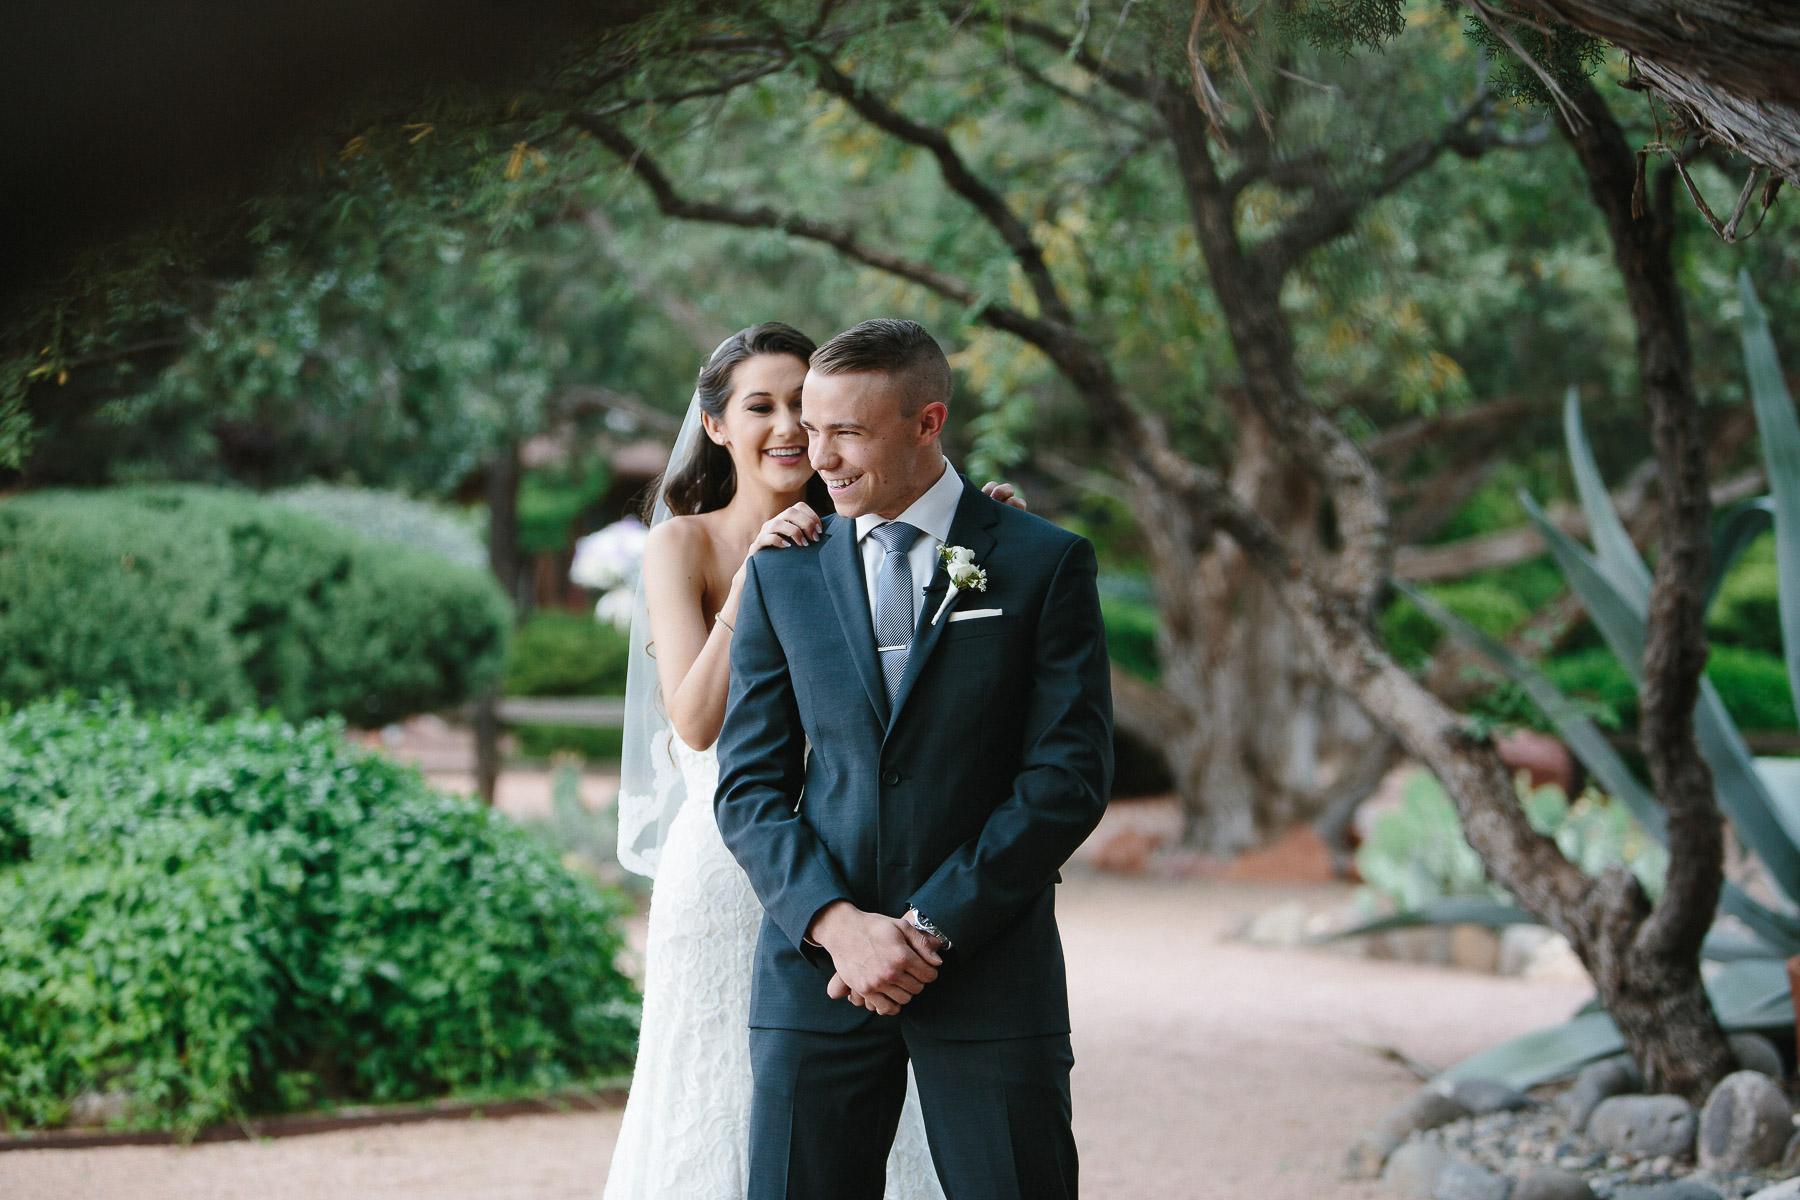 170528-Malkin-Wedding-Sedona-Arizona-Wedding-Photography-Sky-Ranch-Lodge-1005.jpg